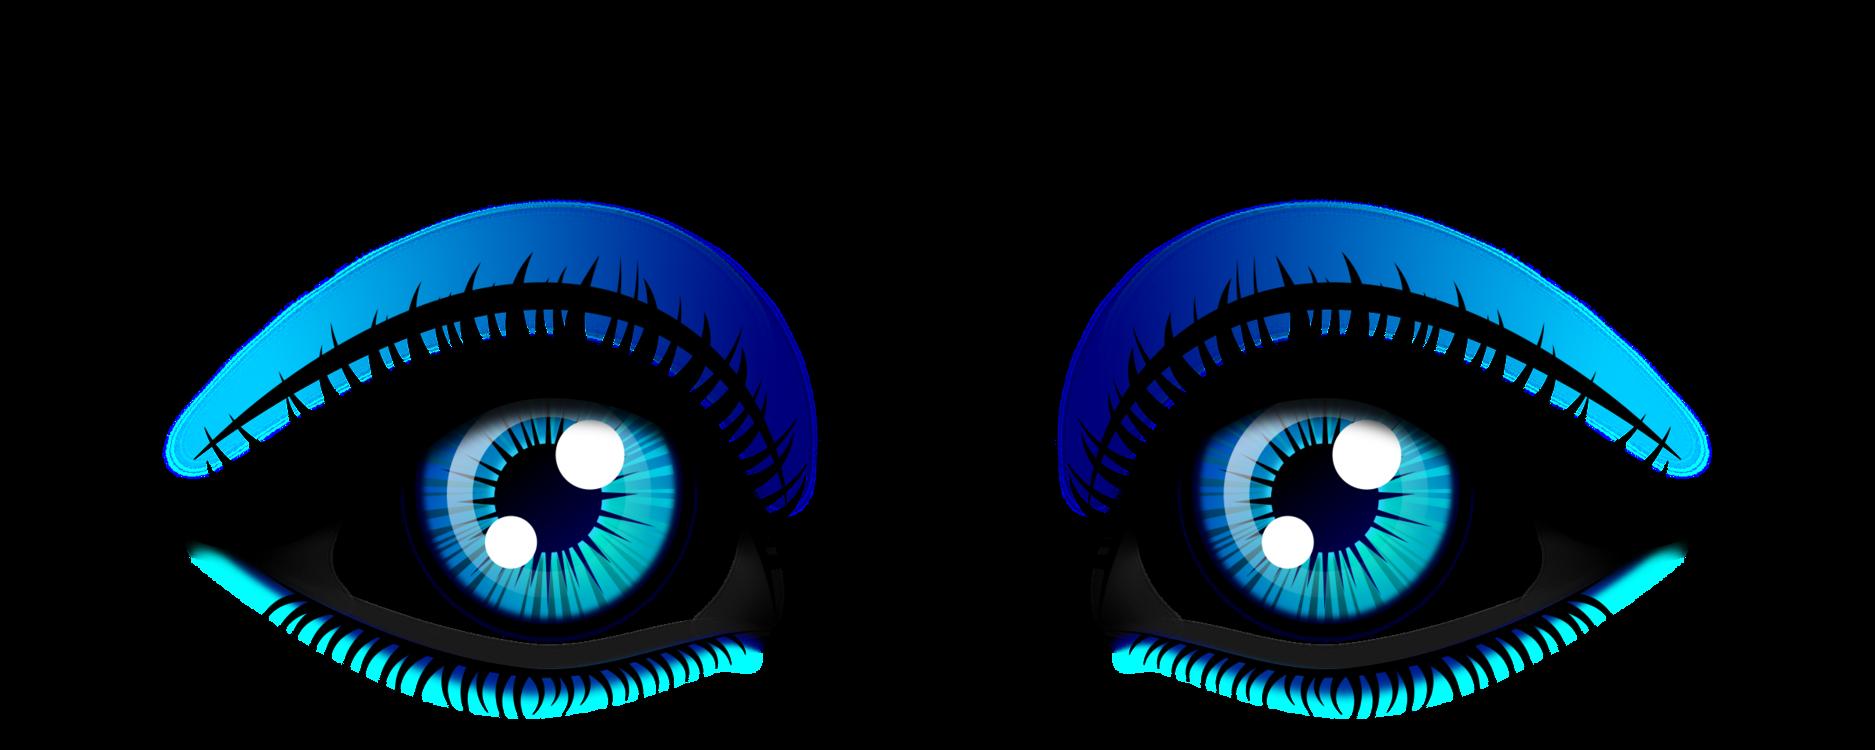 eyebrow woman eye color free commercial clipart eye woman eyebrow rh kisscc0 com Iris Background Clip Art Flower Clip Art